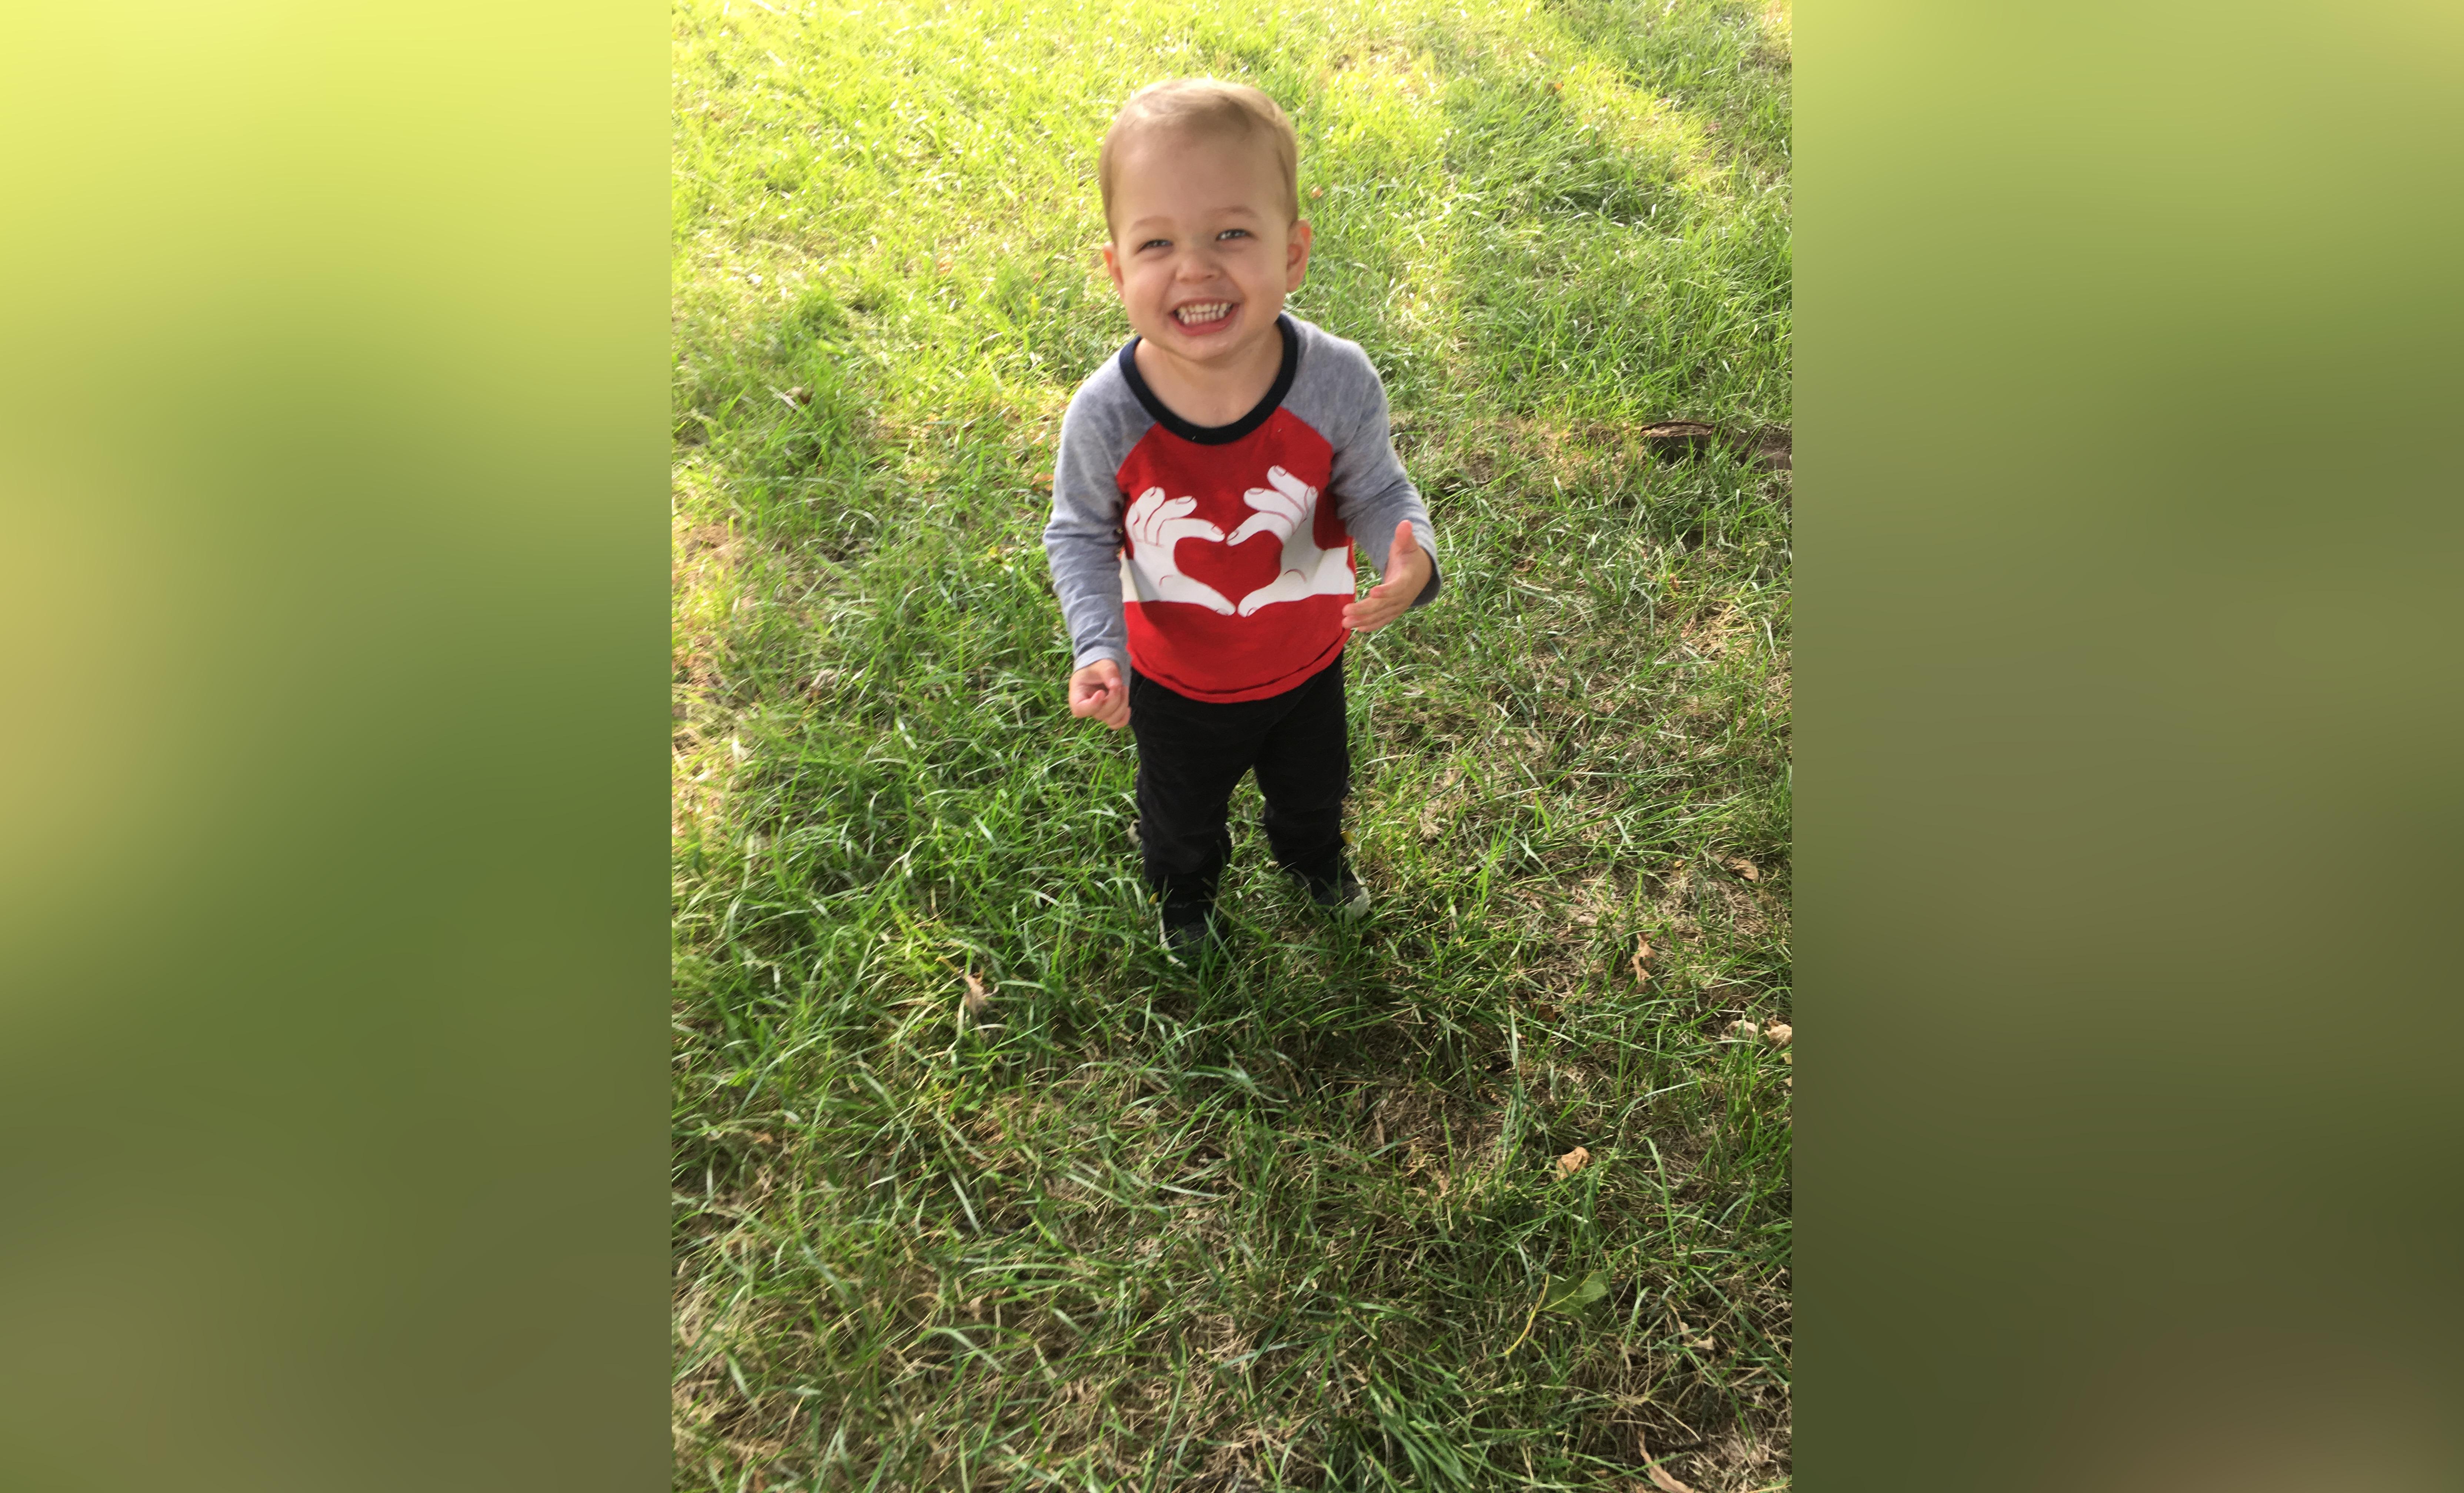 Little boy smiling outside, color photo